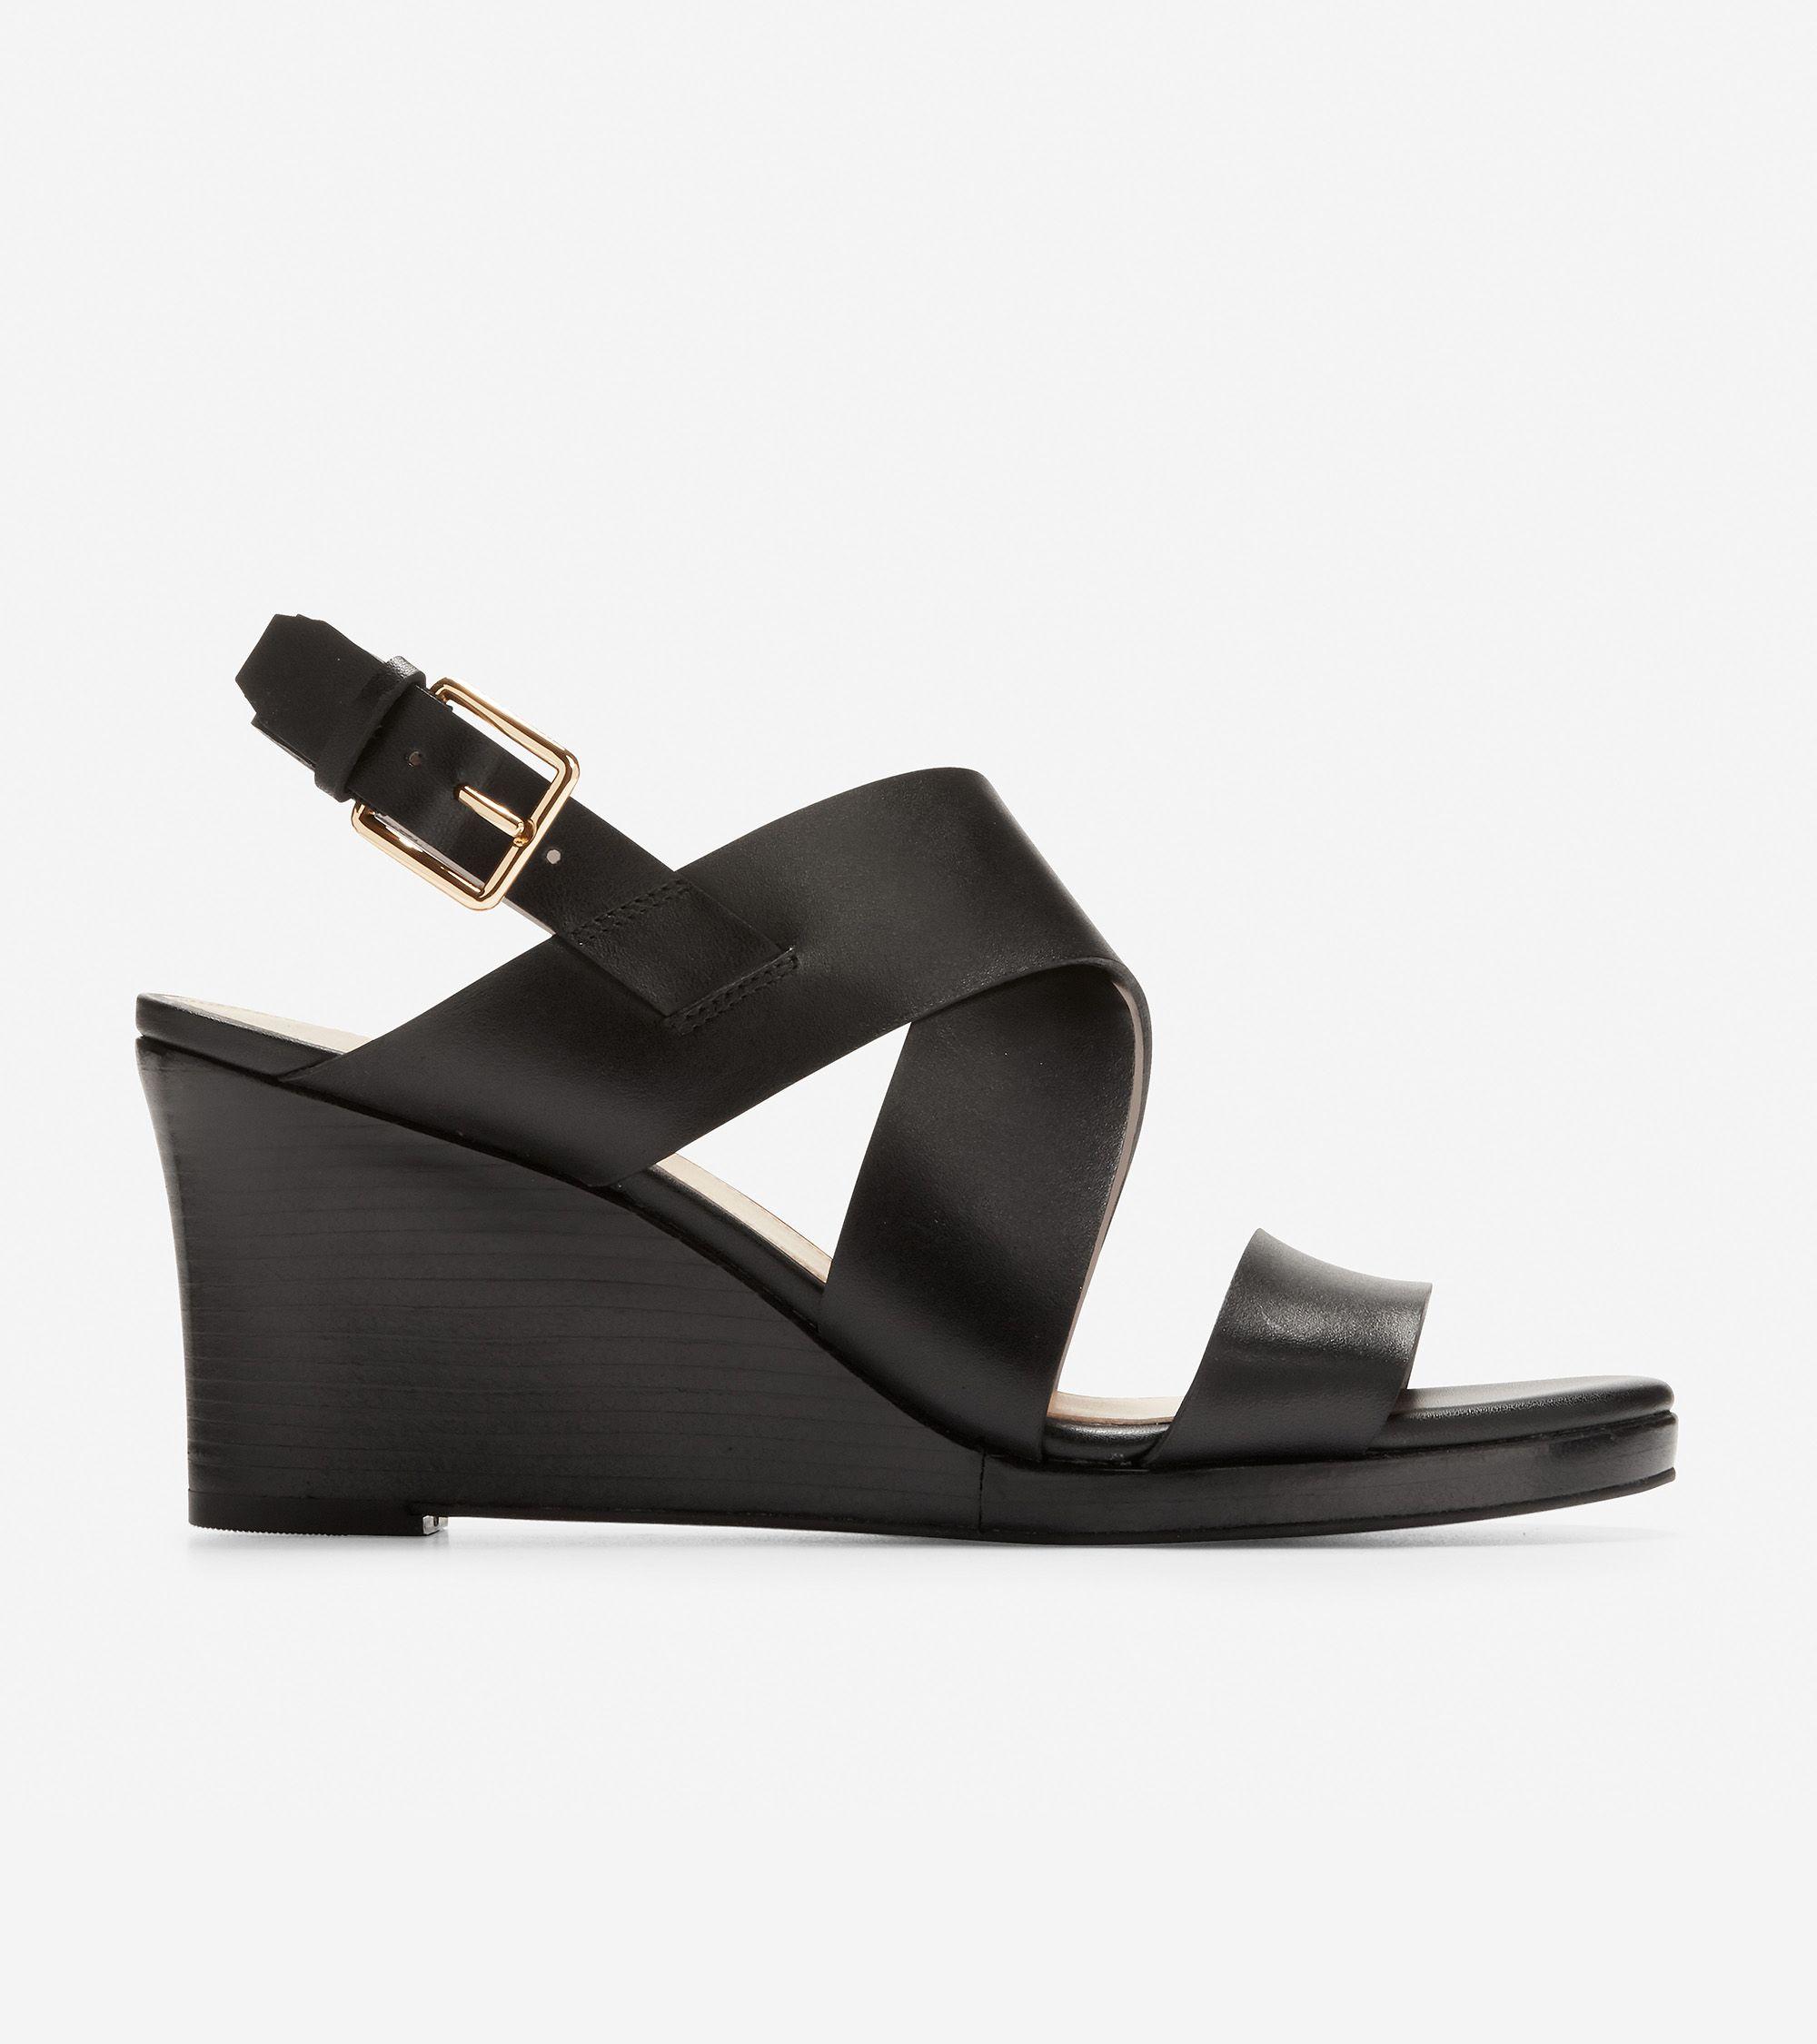 Cole Haan Penelope Wedge Sandal (70mm) | Wedge sandals